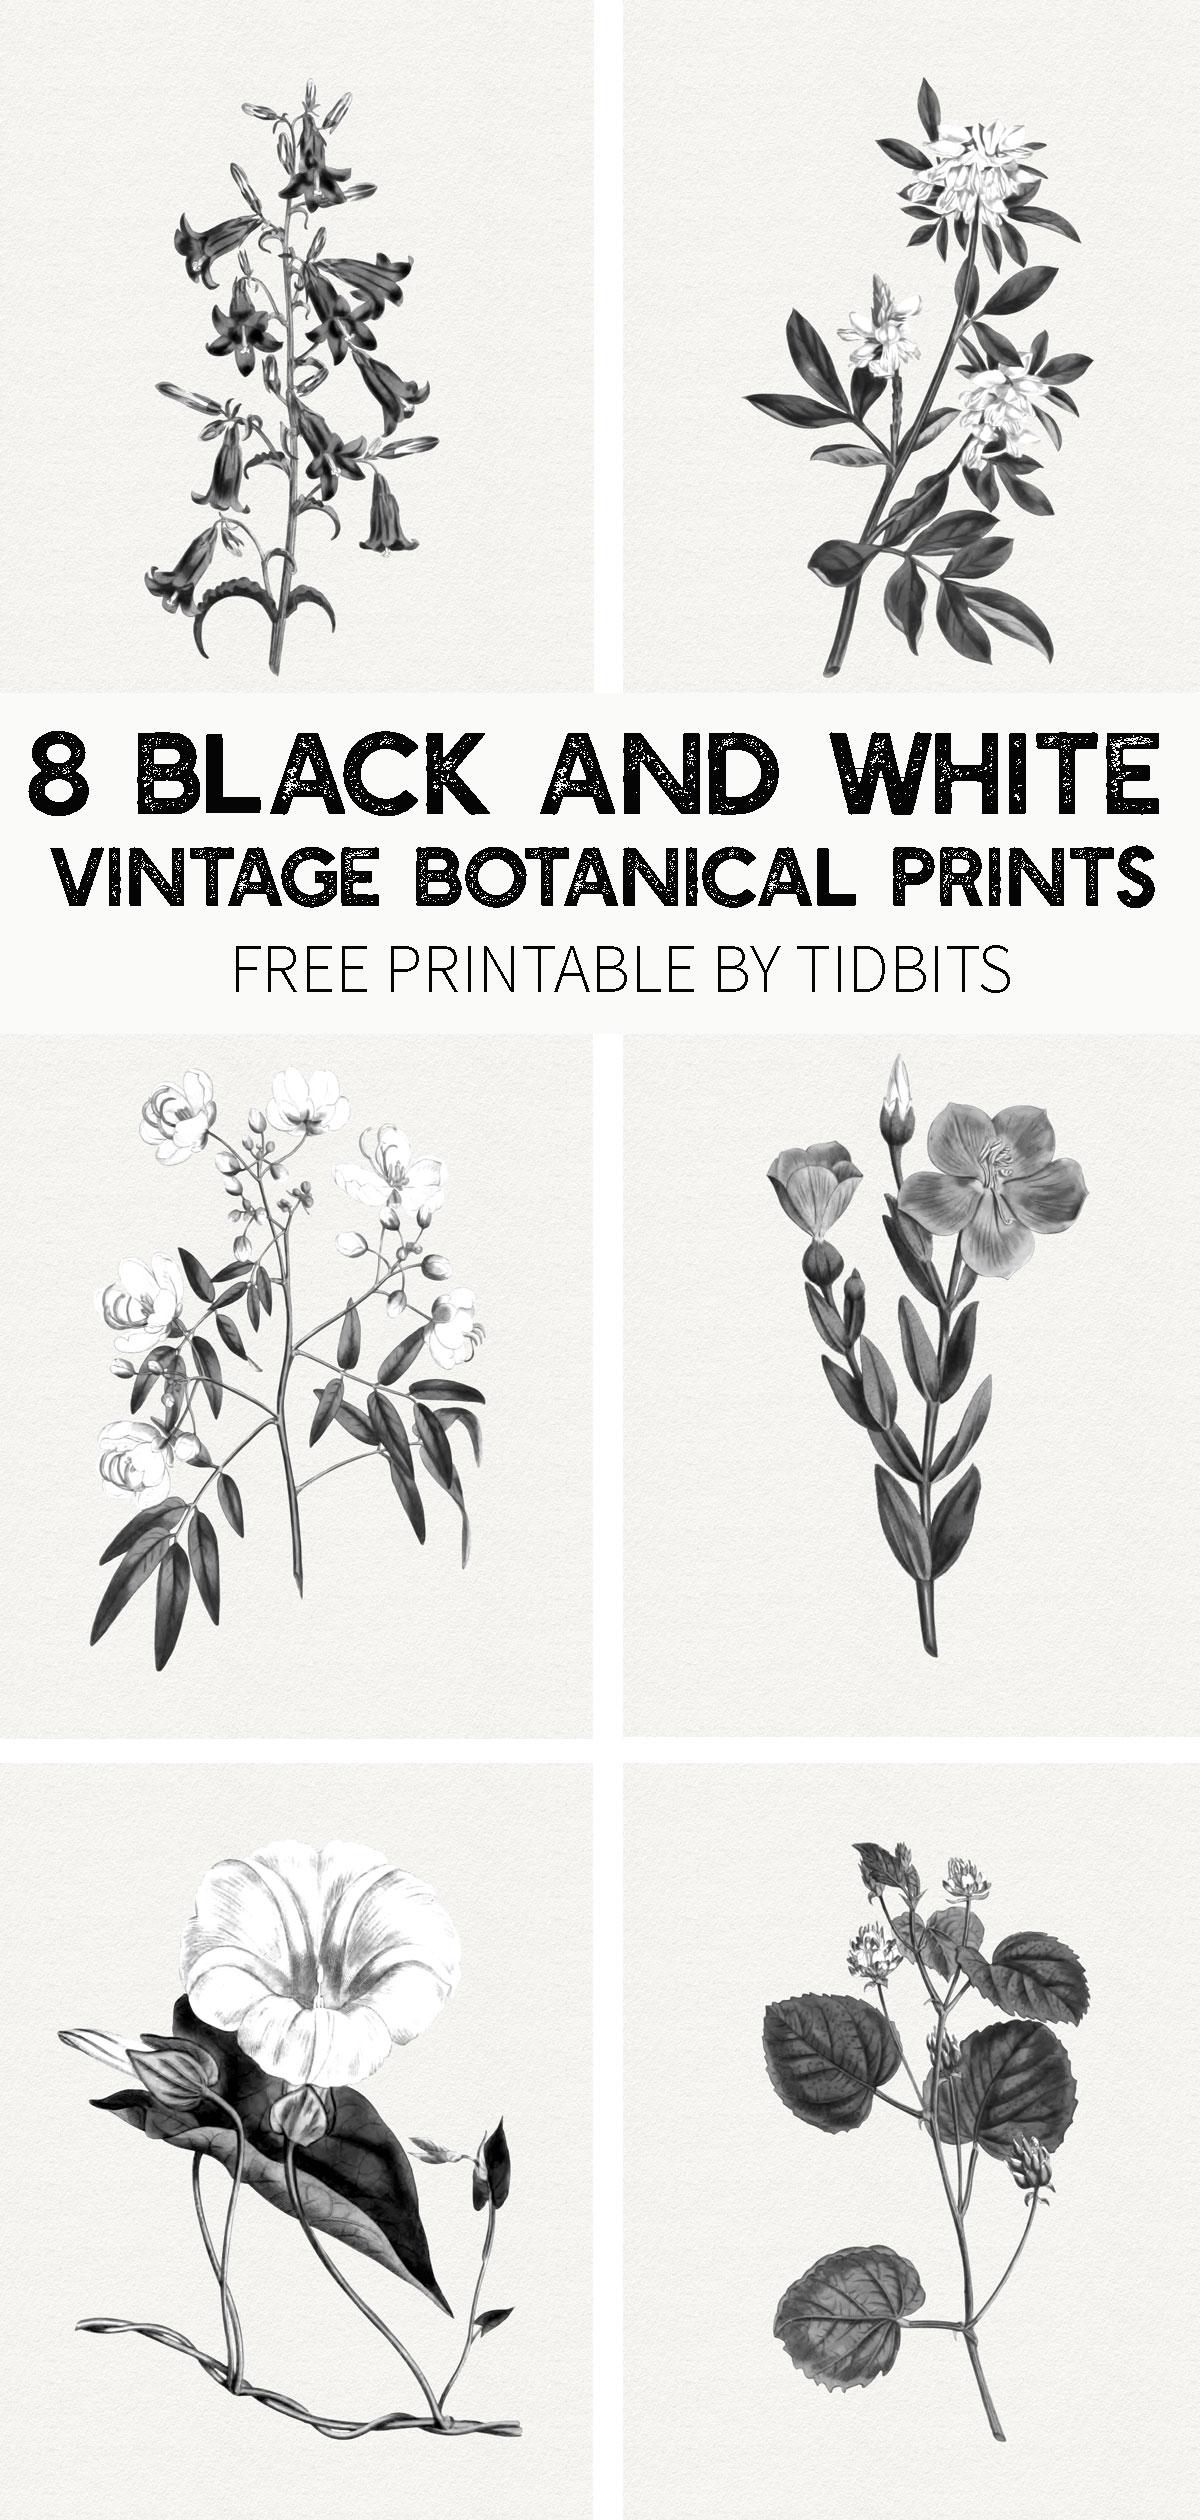 Free Black And White Vintage Botanical Prints Tidbits